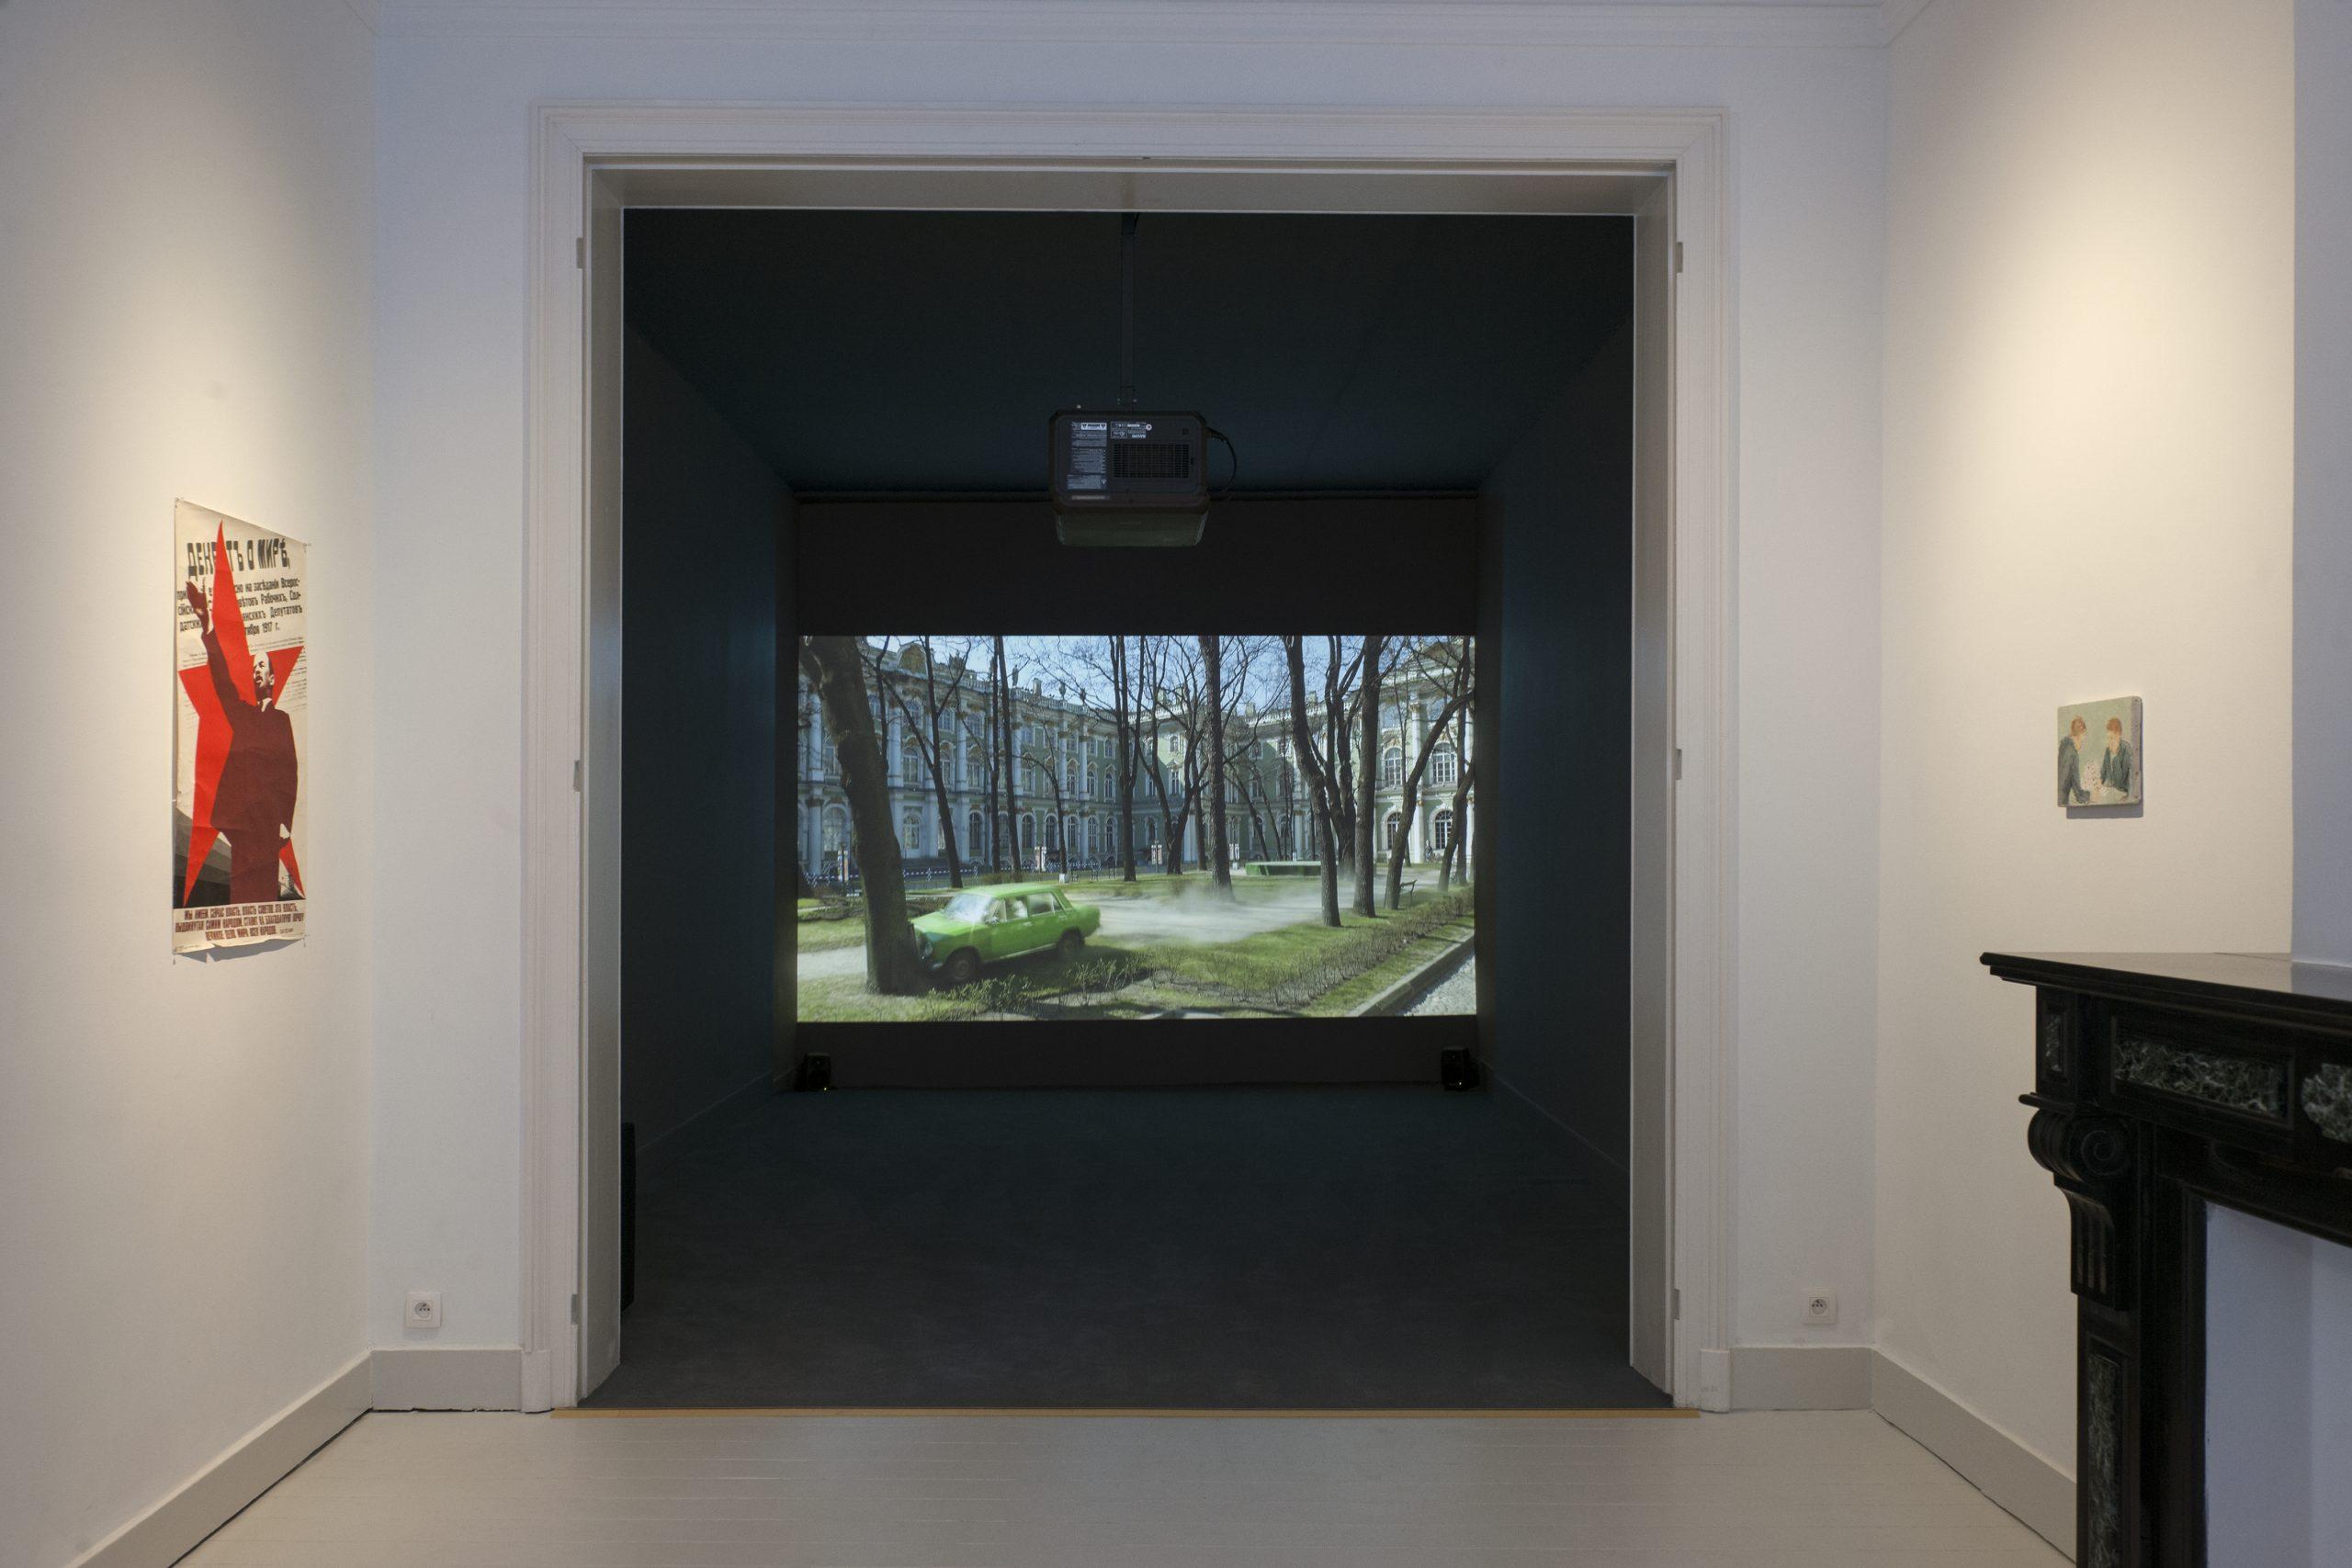 Francis Alys, installation view at Jan Mot, 2017